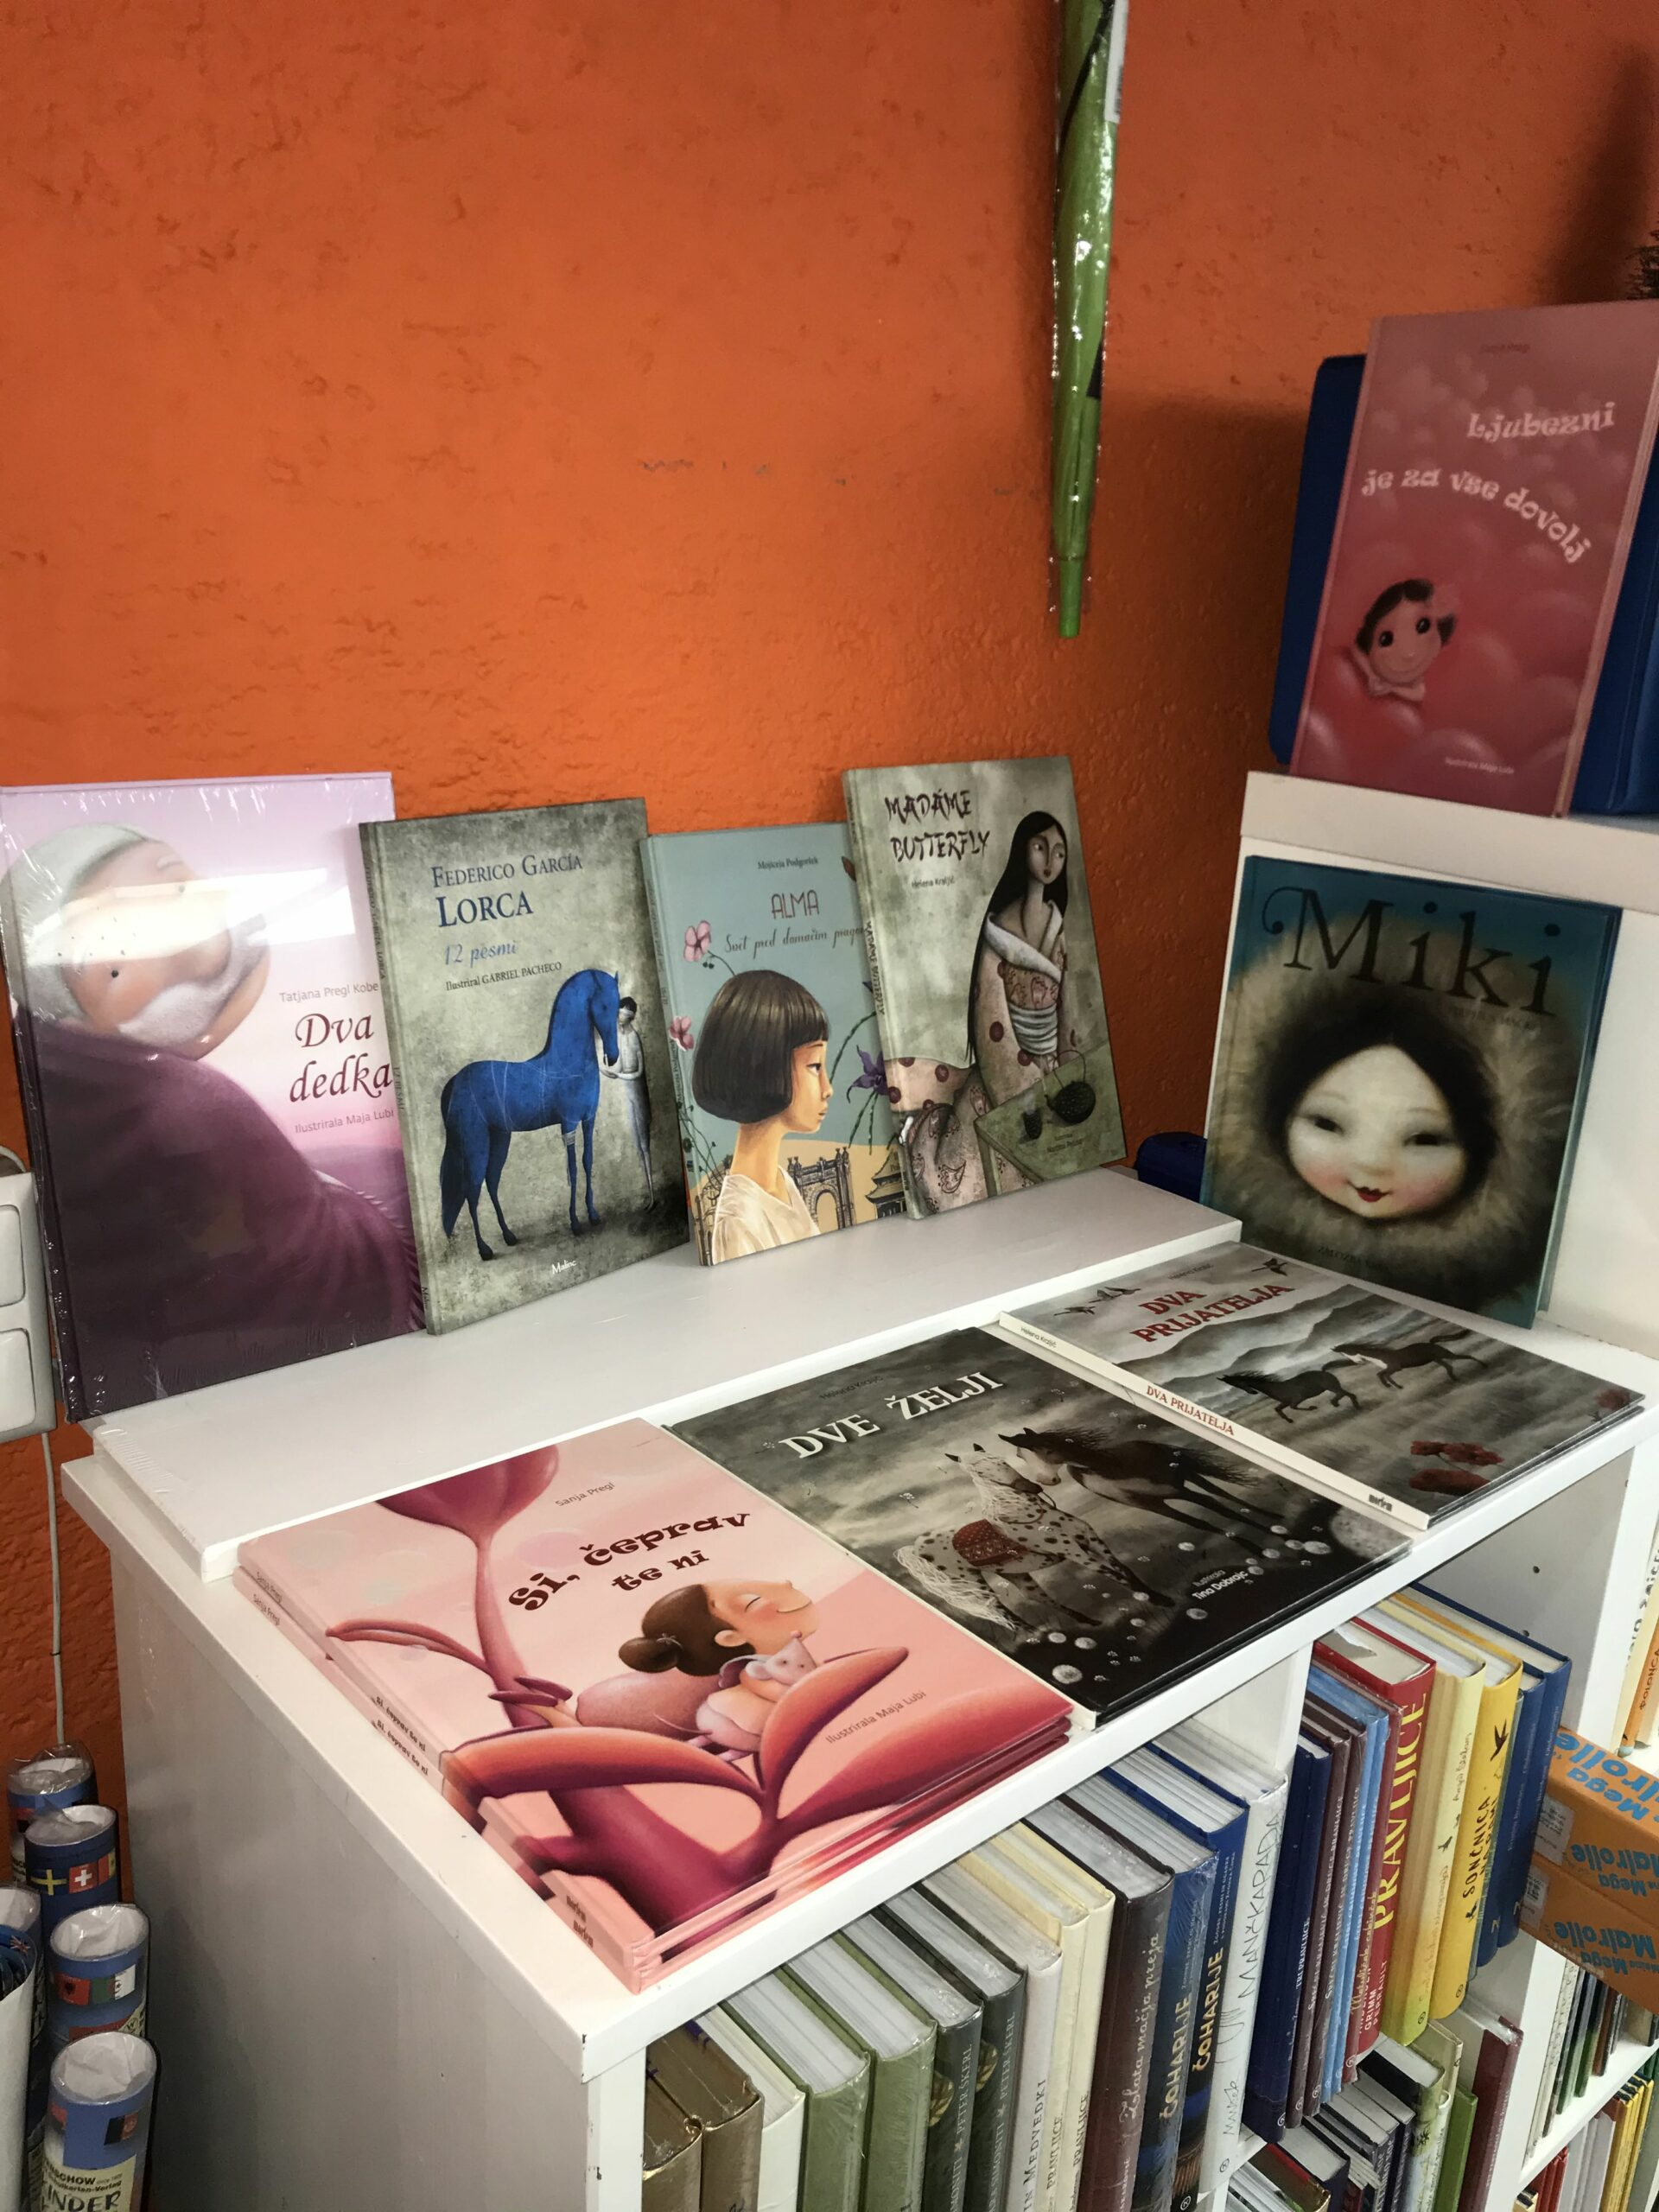 🌞Otroški oddelek se spreminja / Die Kinderbuchabteilung verändert sich 🌞